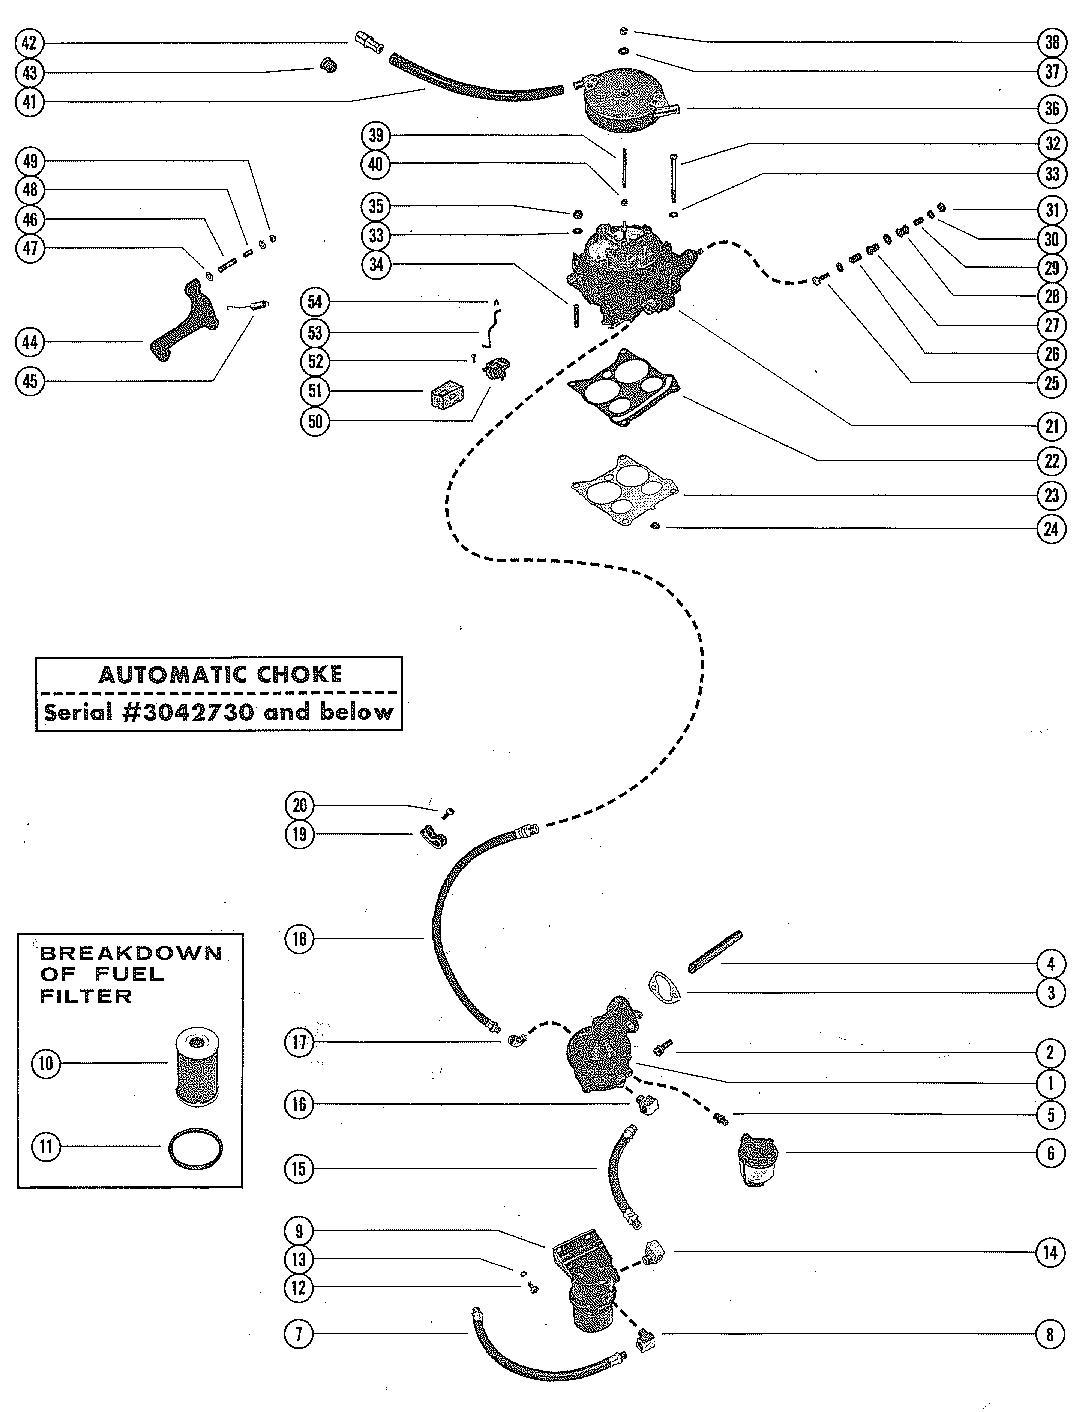 Mercruiser 325 Mie Gm 427 V 8